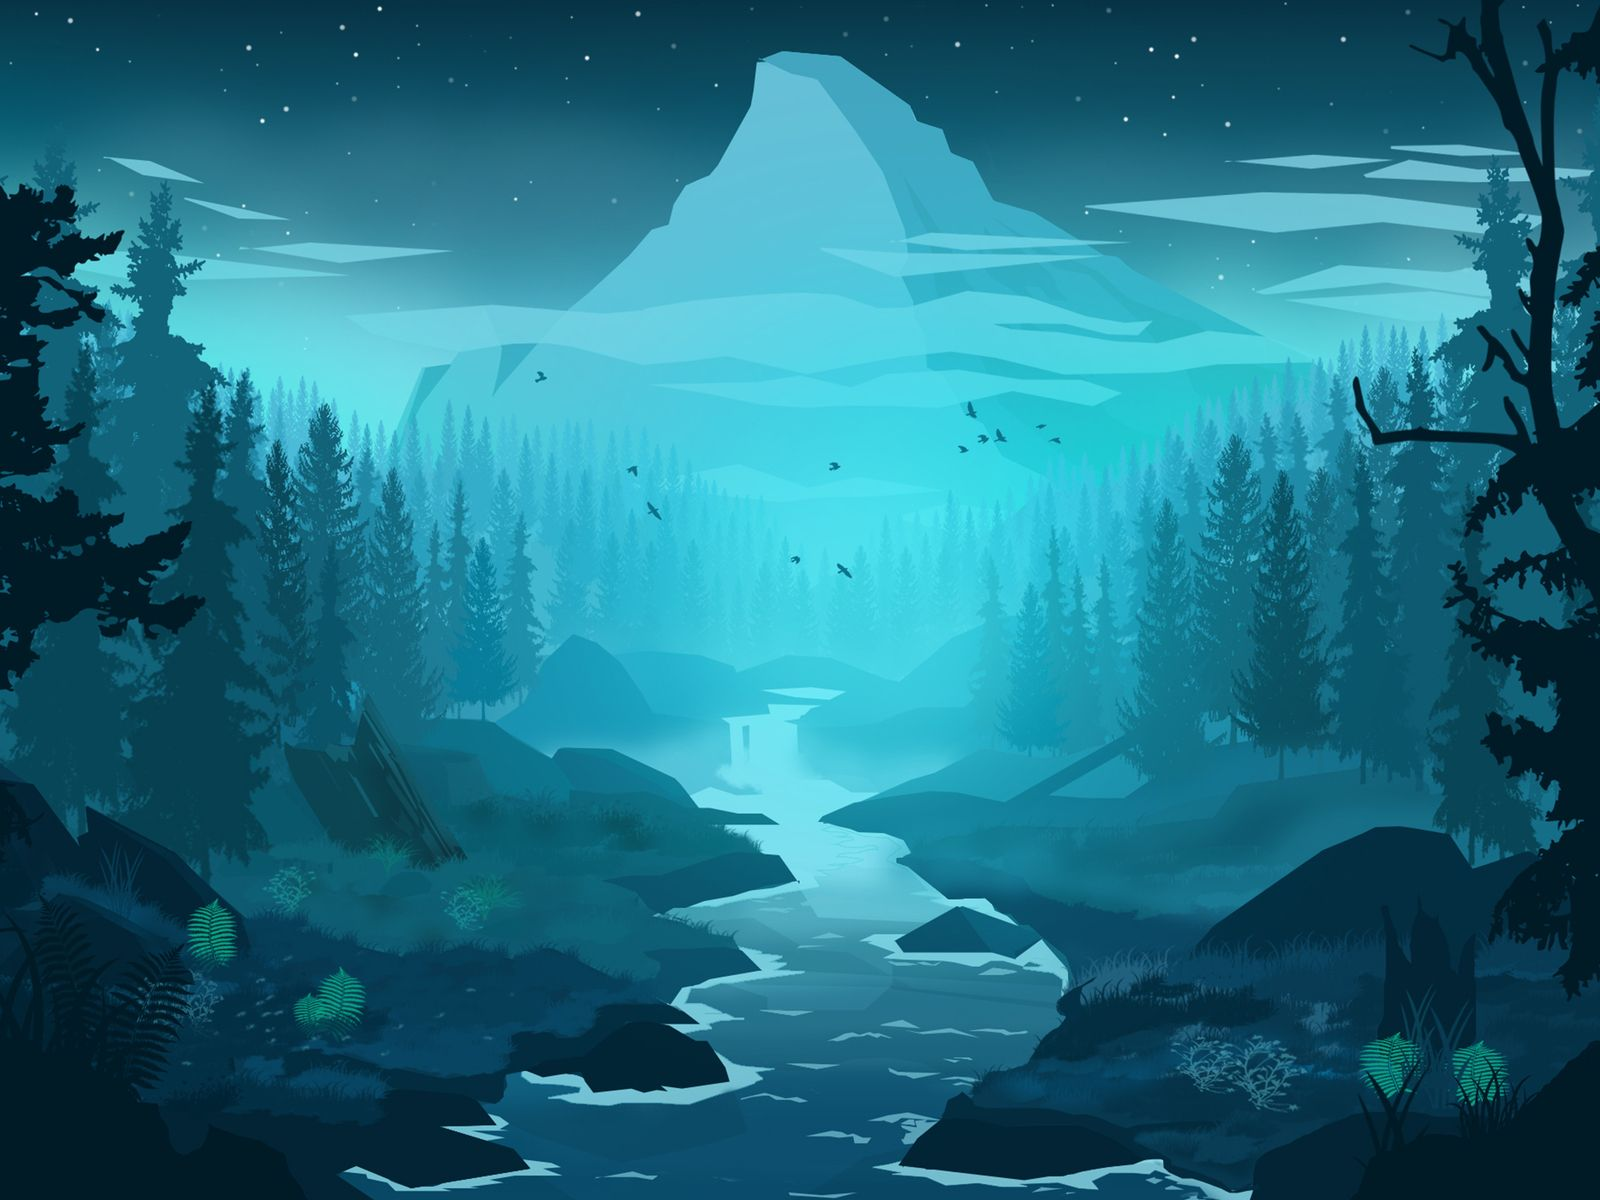 Blue Forest Landscape Wallpaper Forest Art Winter Forest